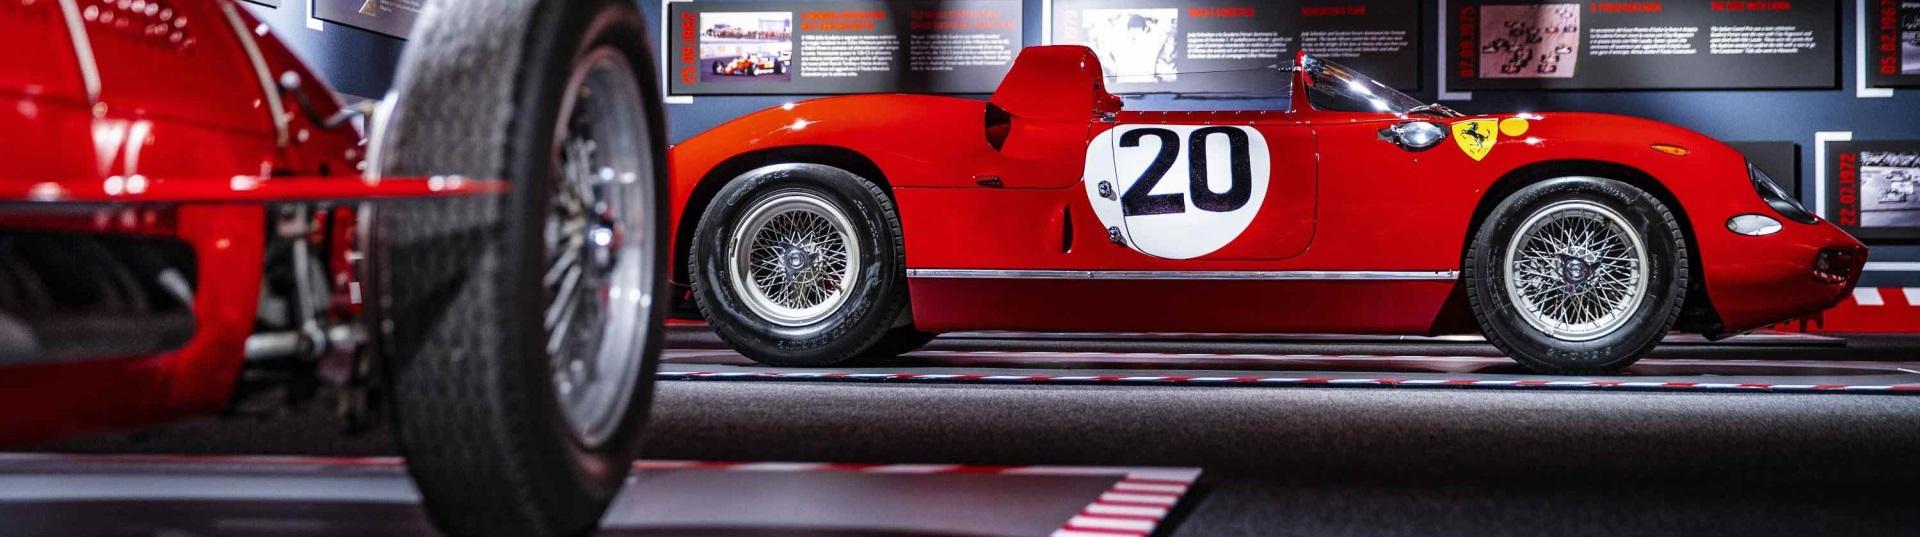 Expo Ferrari_1920